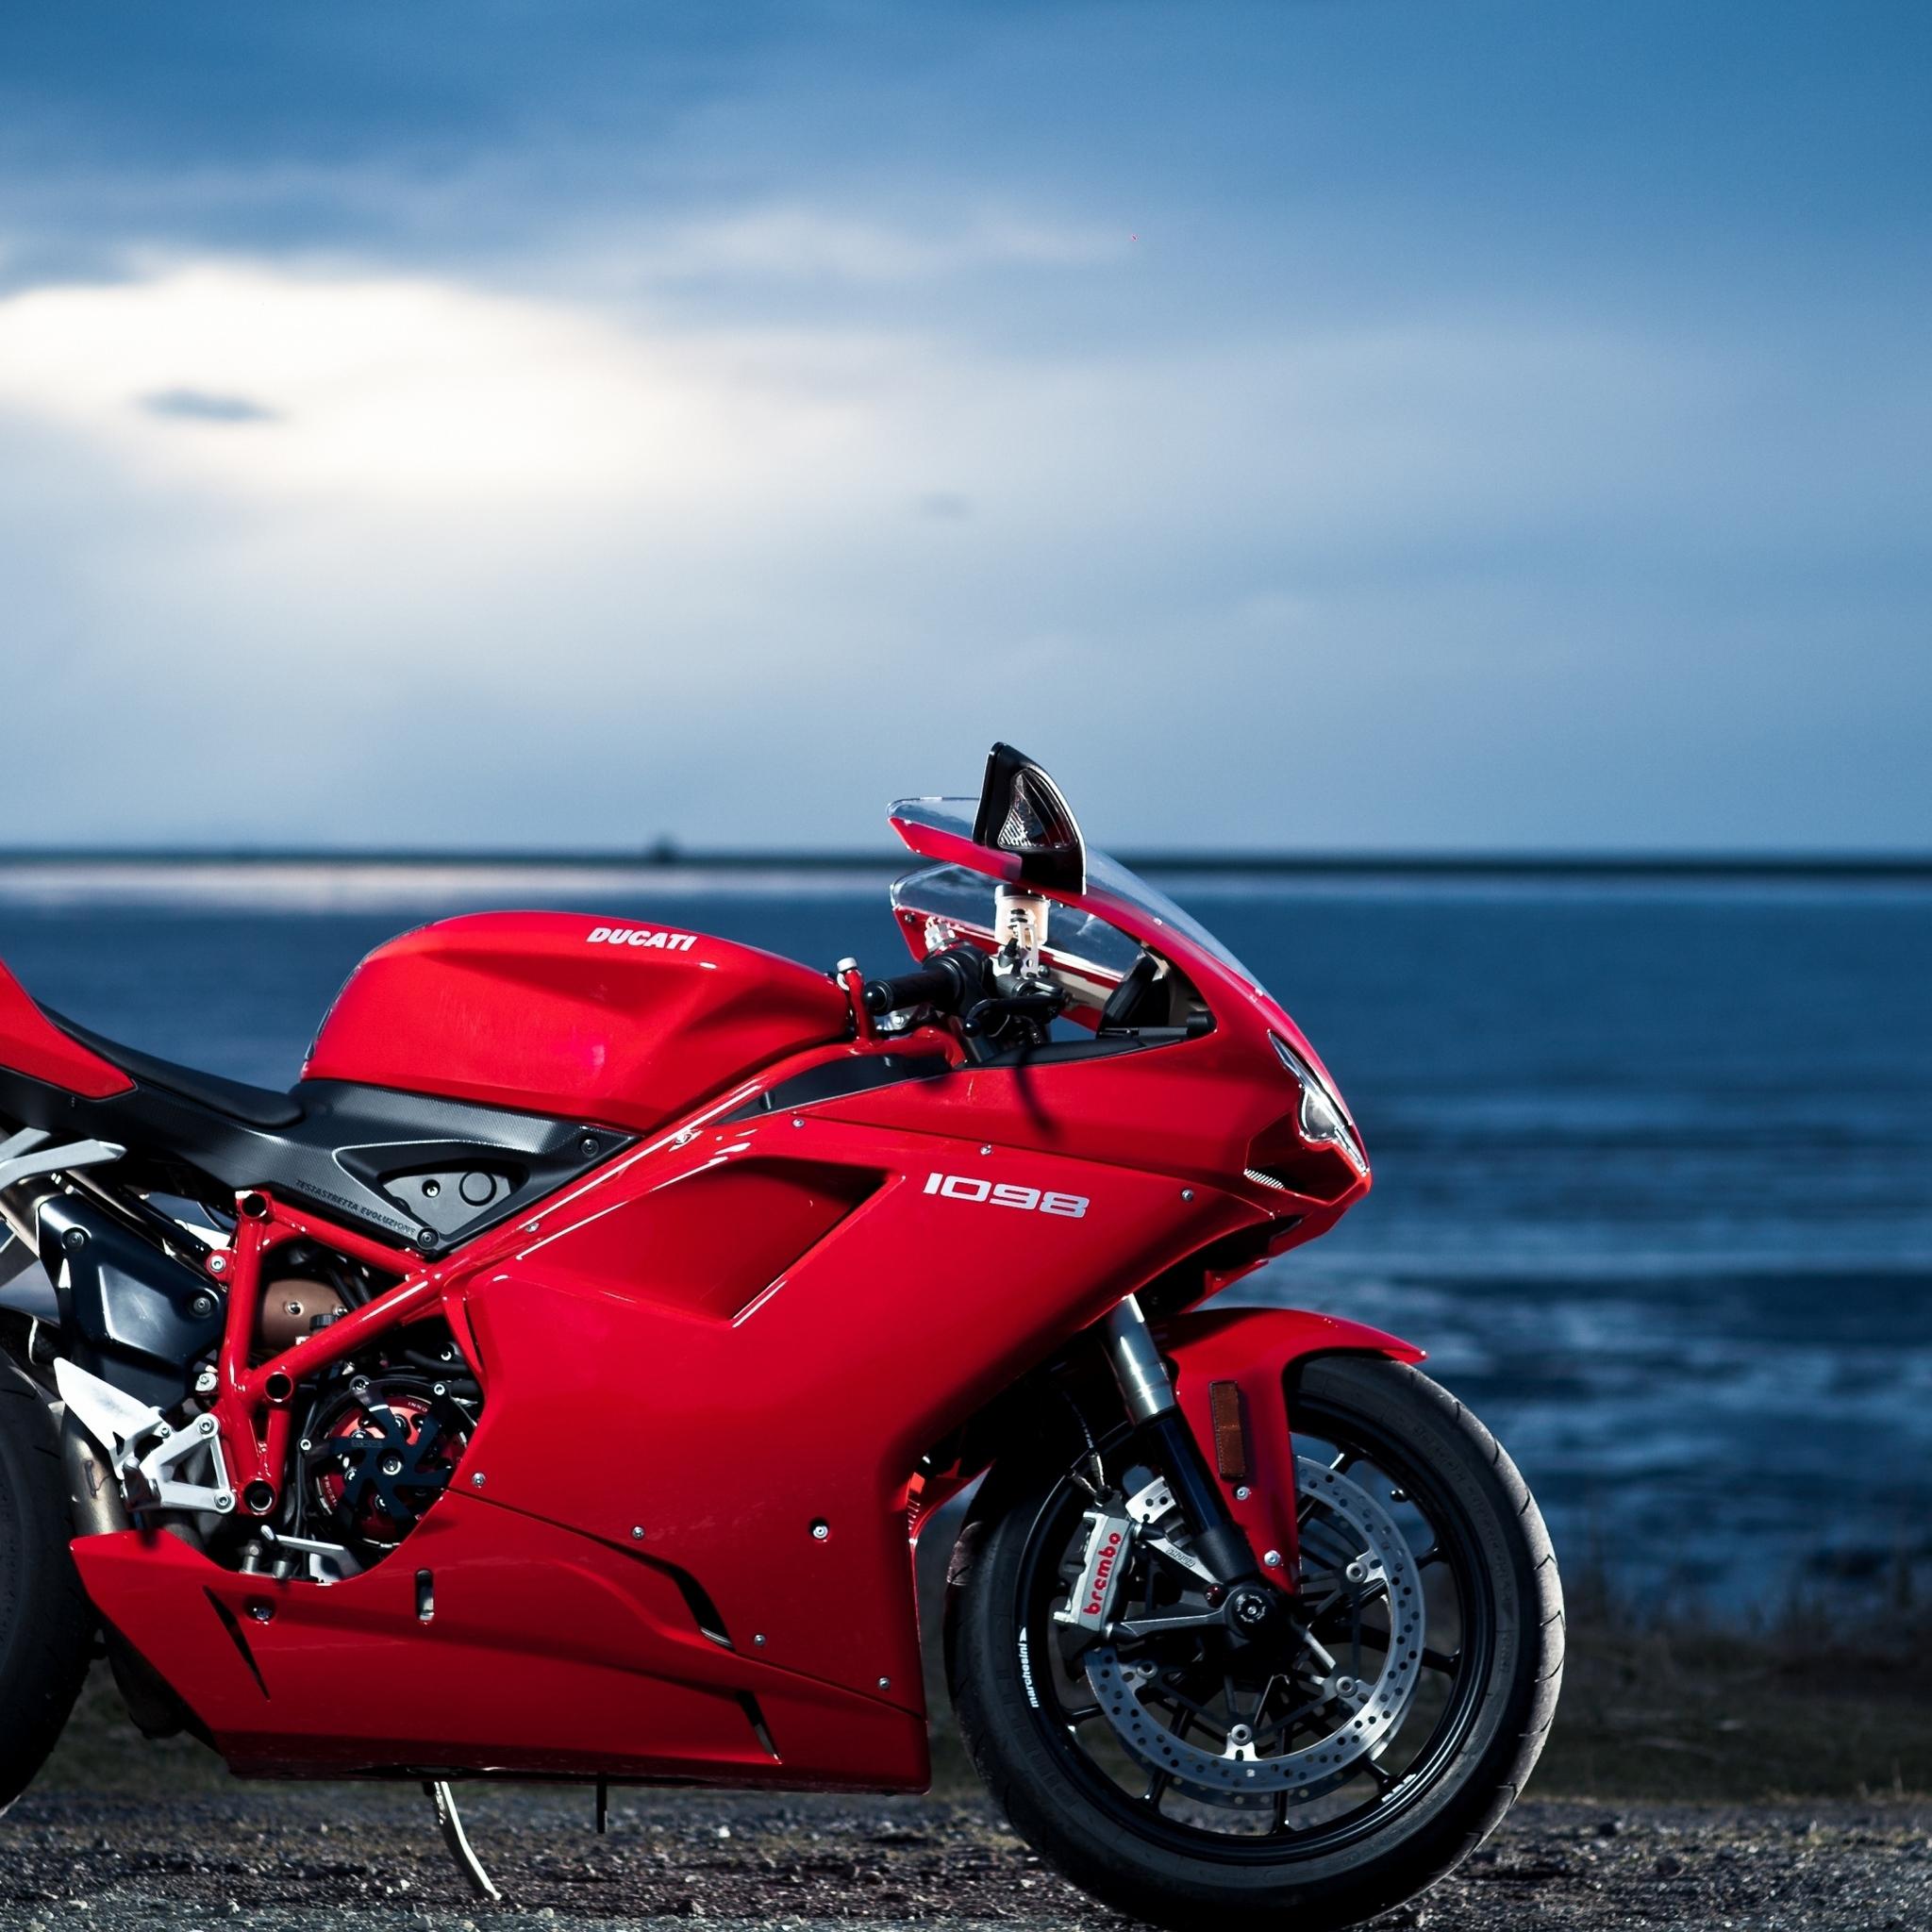 Ducati Motorcycle Wallpaper: 2048x2048 Ducati 1098 4K Ipad Air HD 4k Wallpapers, Images